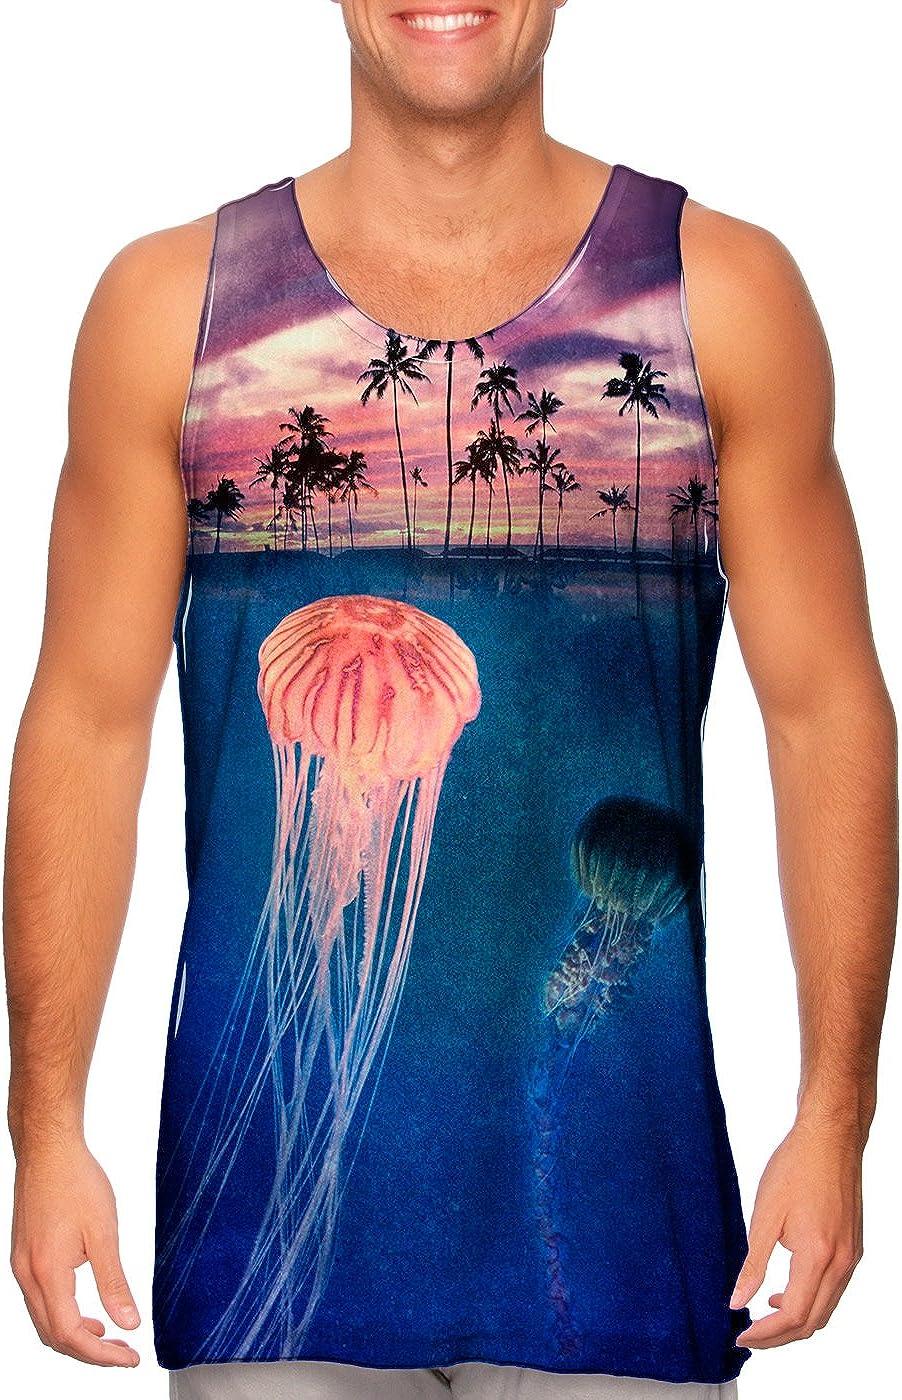 AnimalShirtsUSA- Jellyfish Sky Palm Tree San Cheap sale Francisco Mall Mens -Tshirt- Tank Top